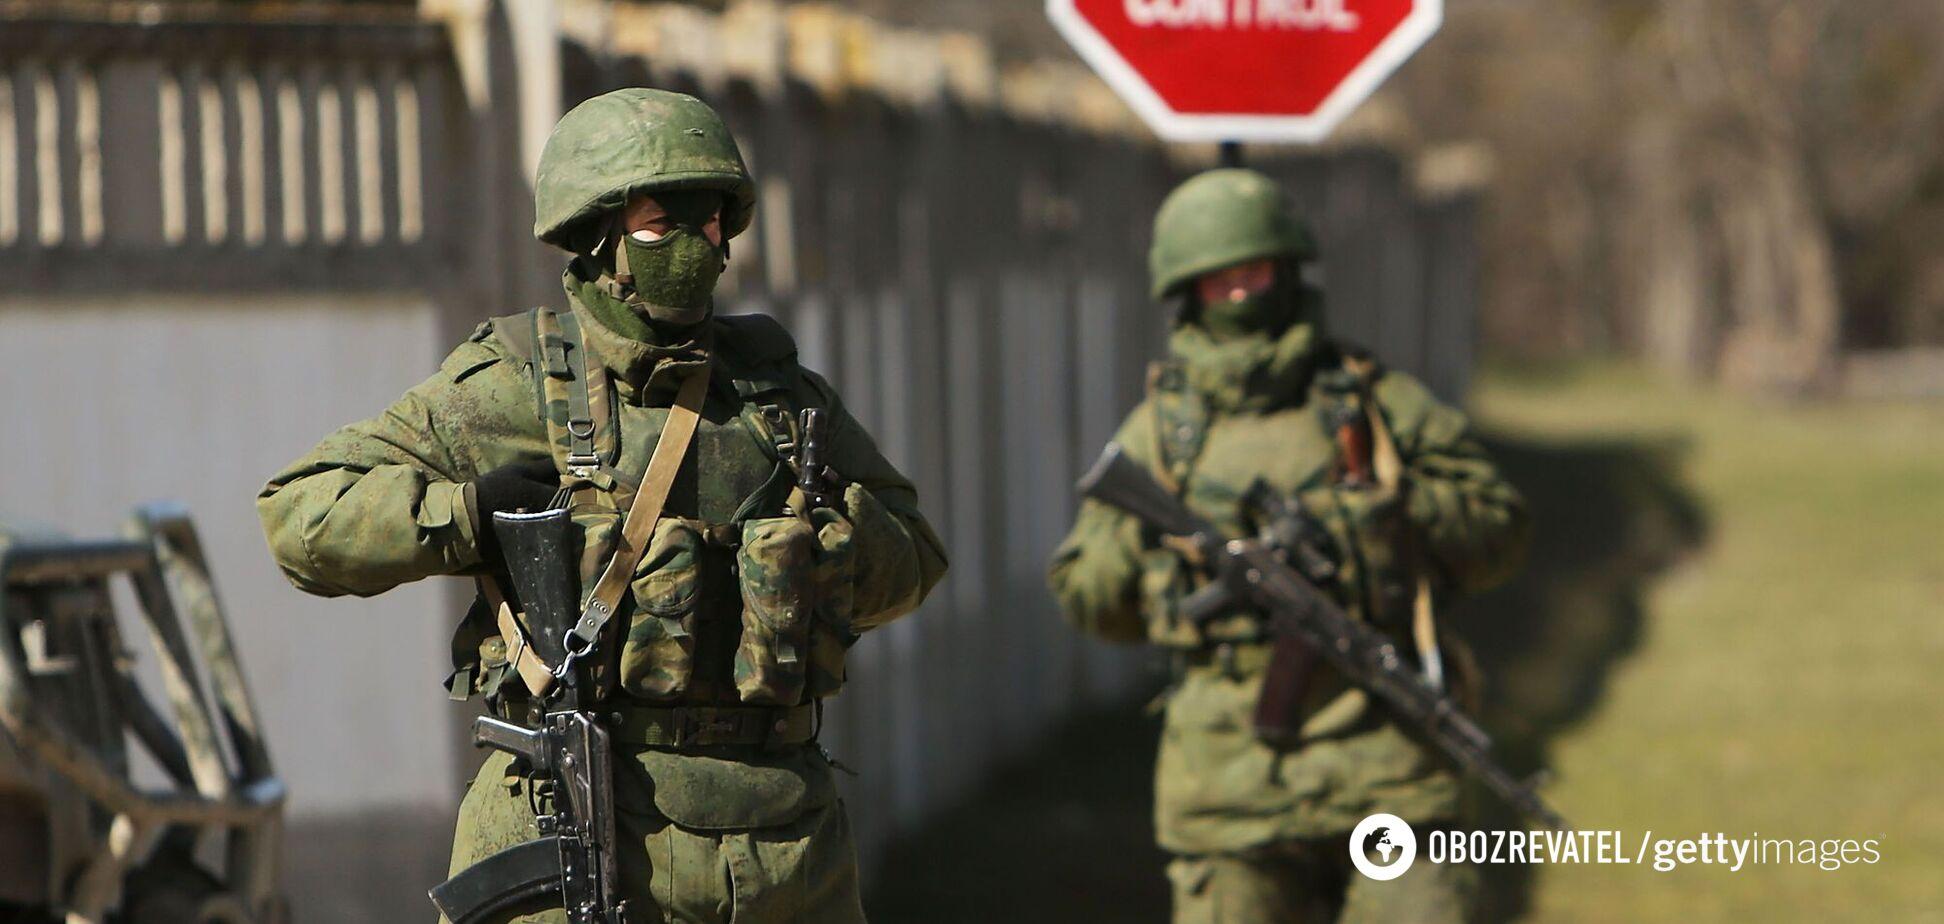 Названы имена военных РФ, причастных к захвату Крыма. Фото